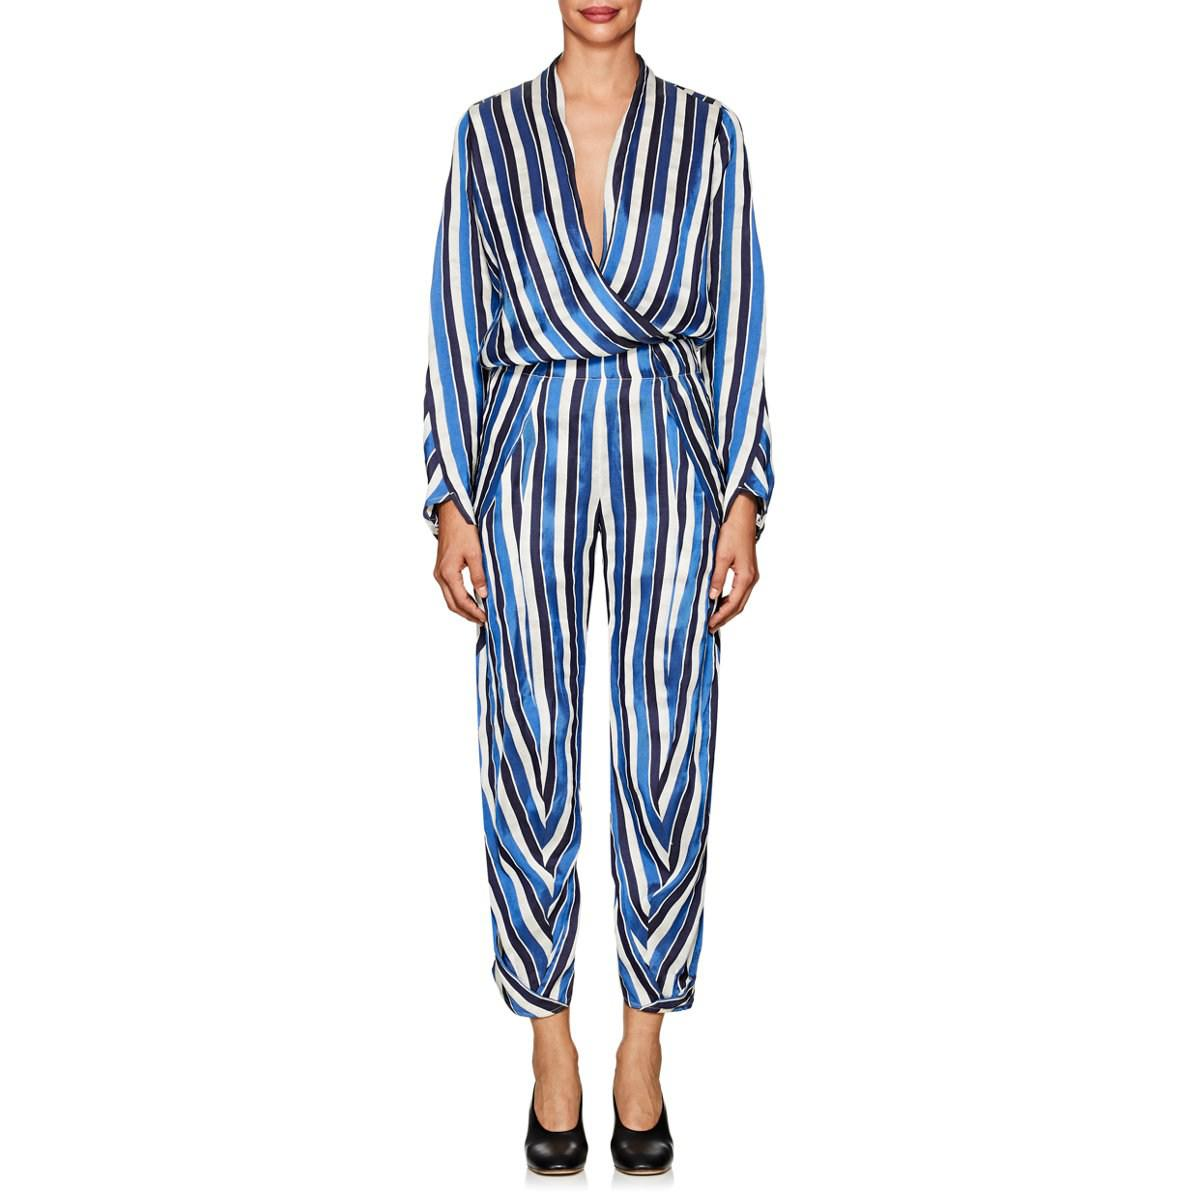 47705924081 Lyst - Zero + Maria Cornejo Takeo Striped Twill Jumpsuit in Blue